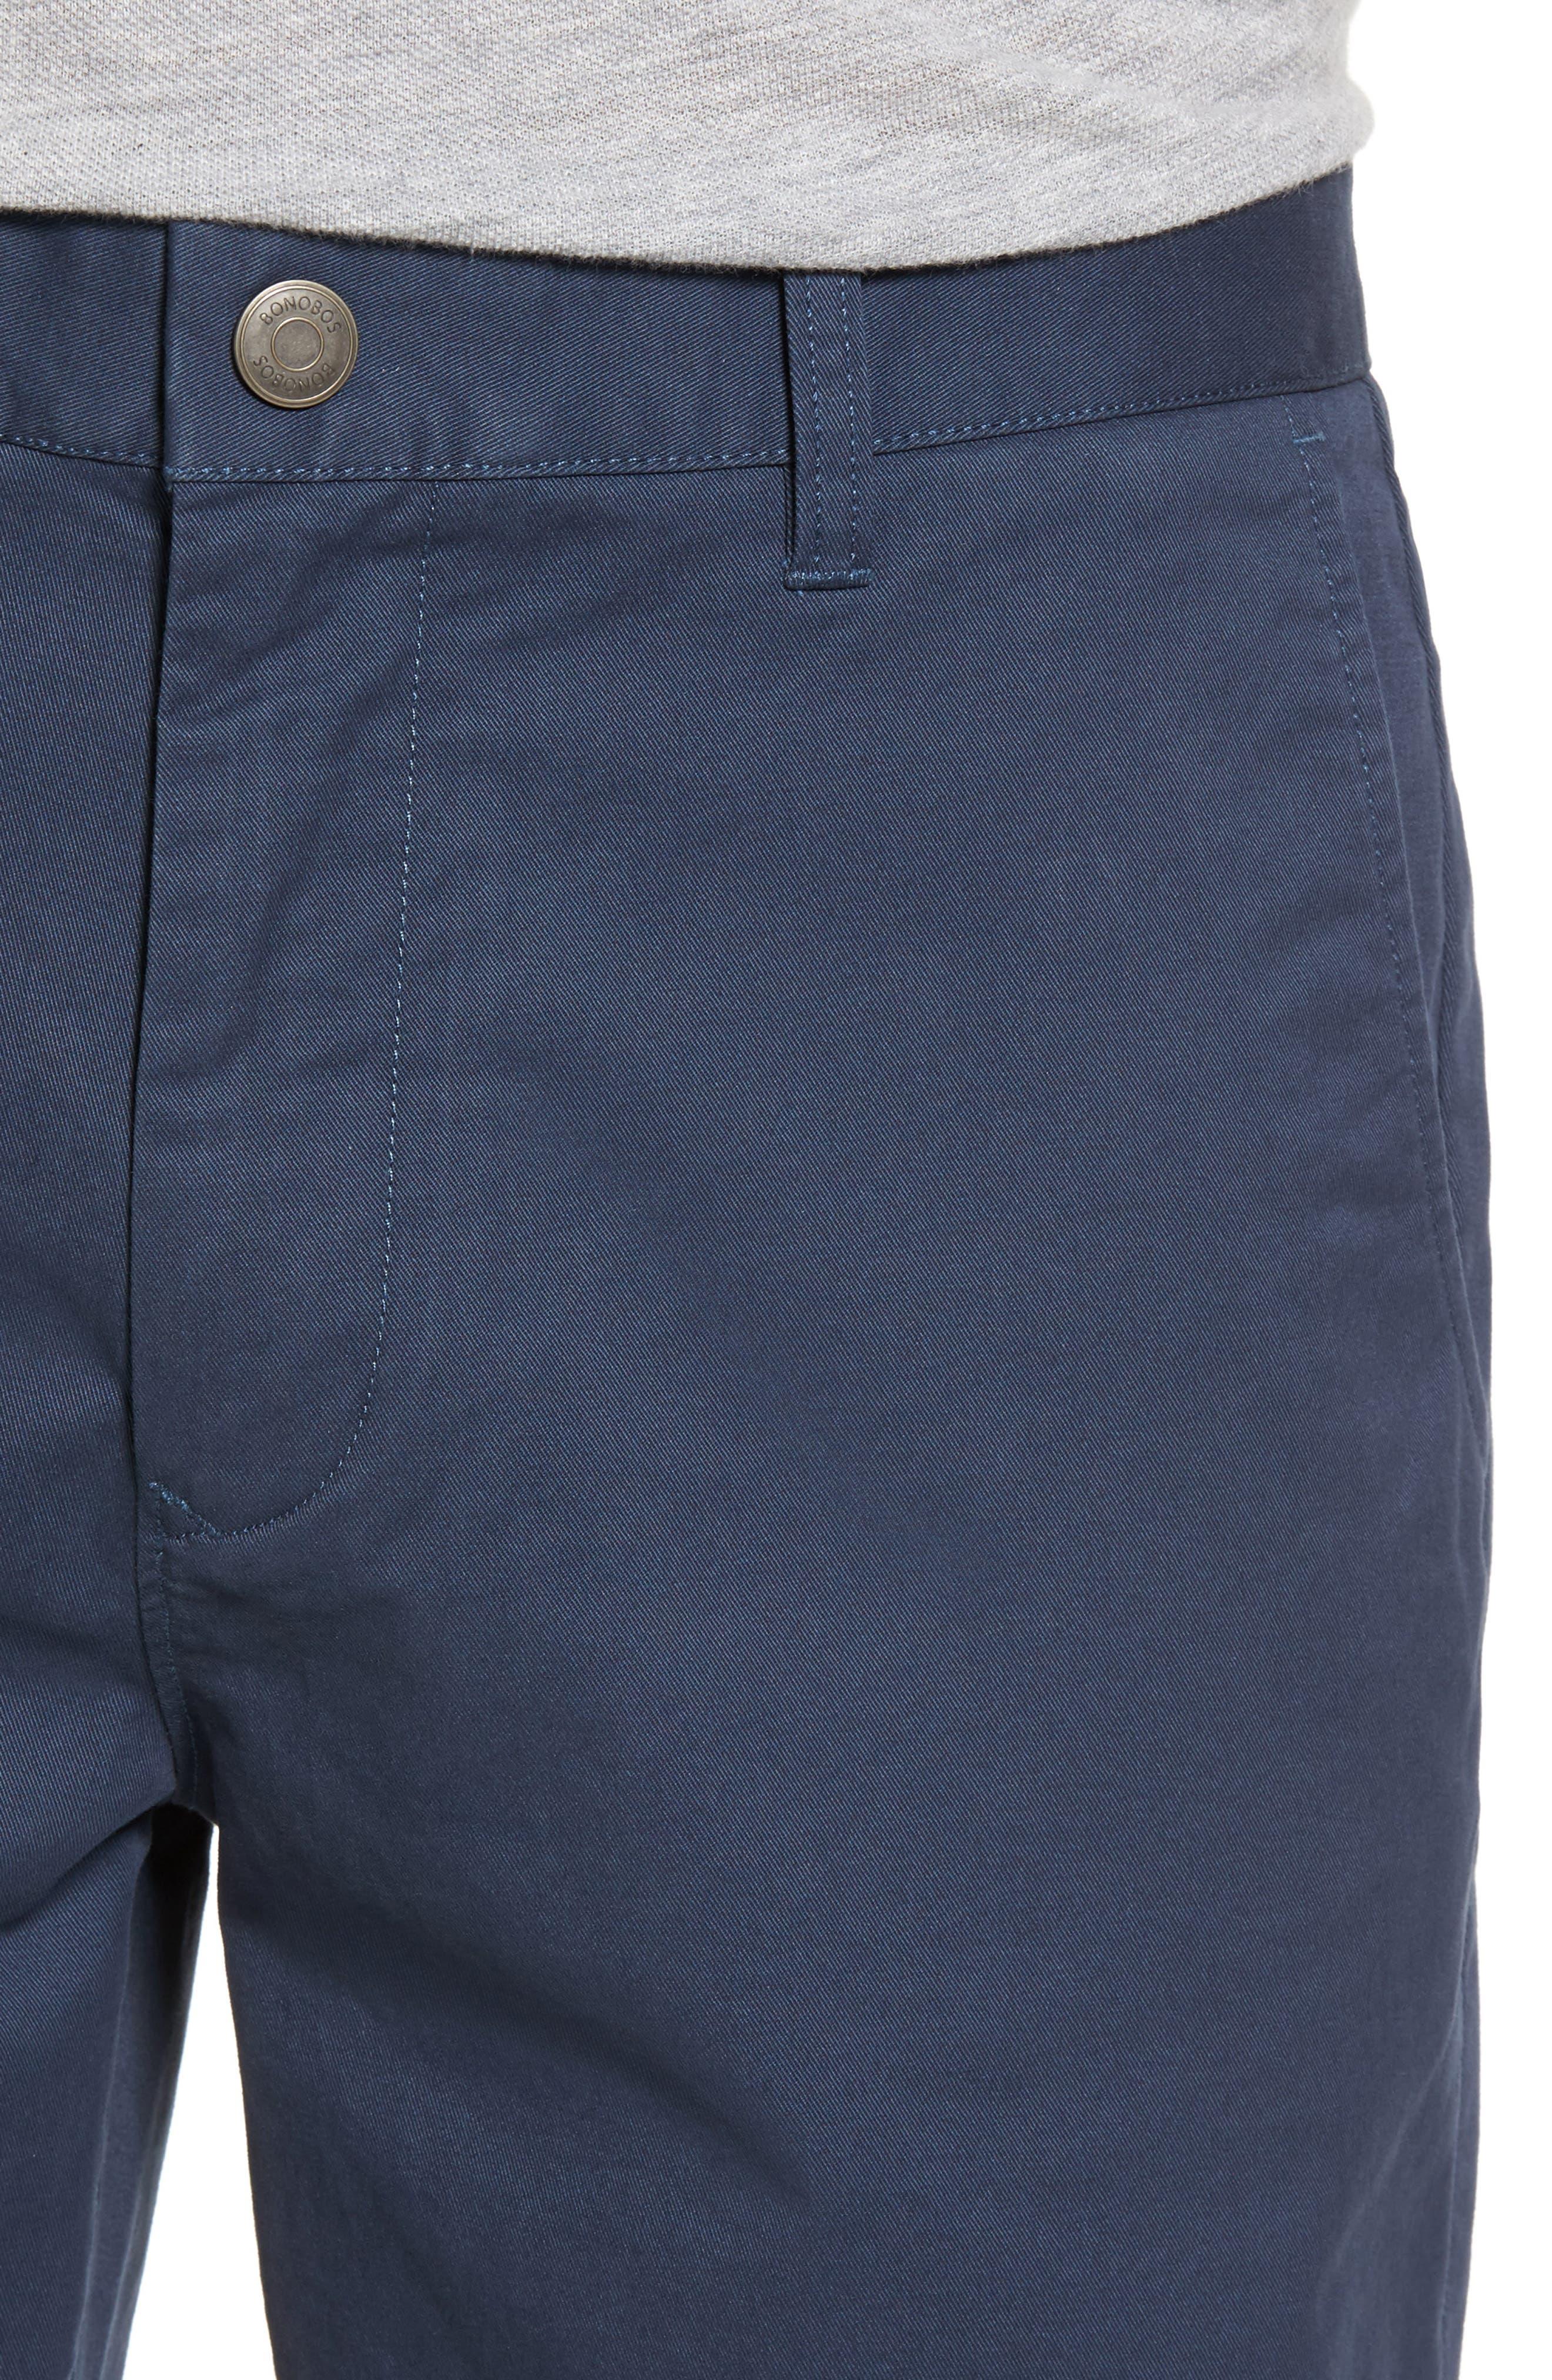 Alternate Image 4  - Bonobos Stretch Washed Chino 9-Inch Shorts